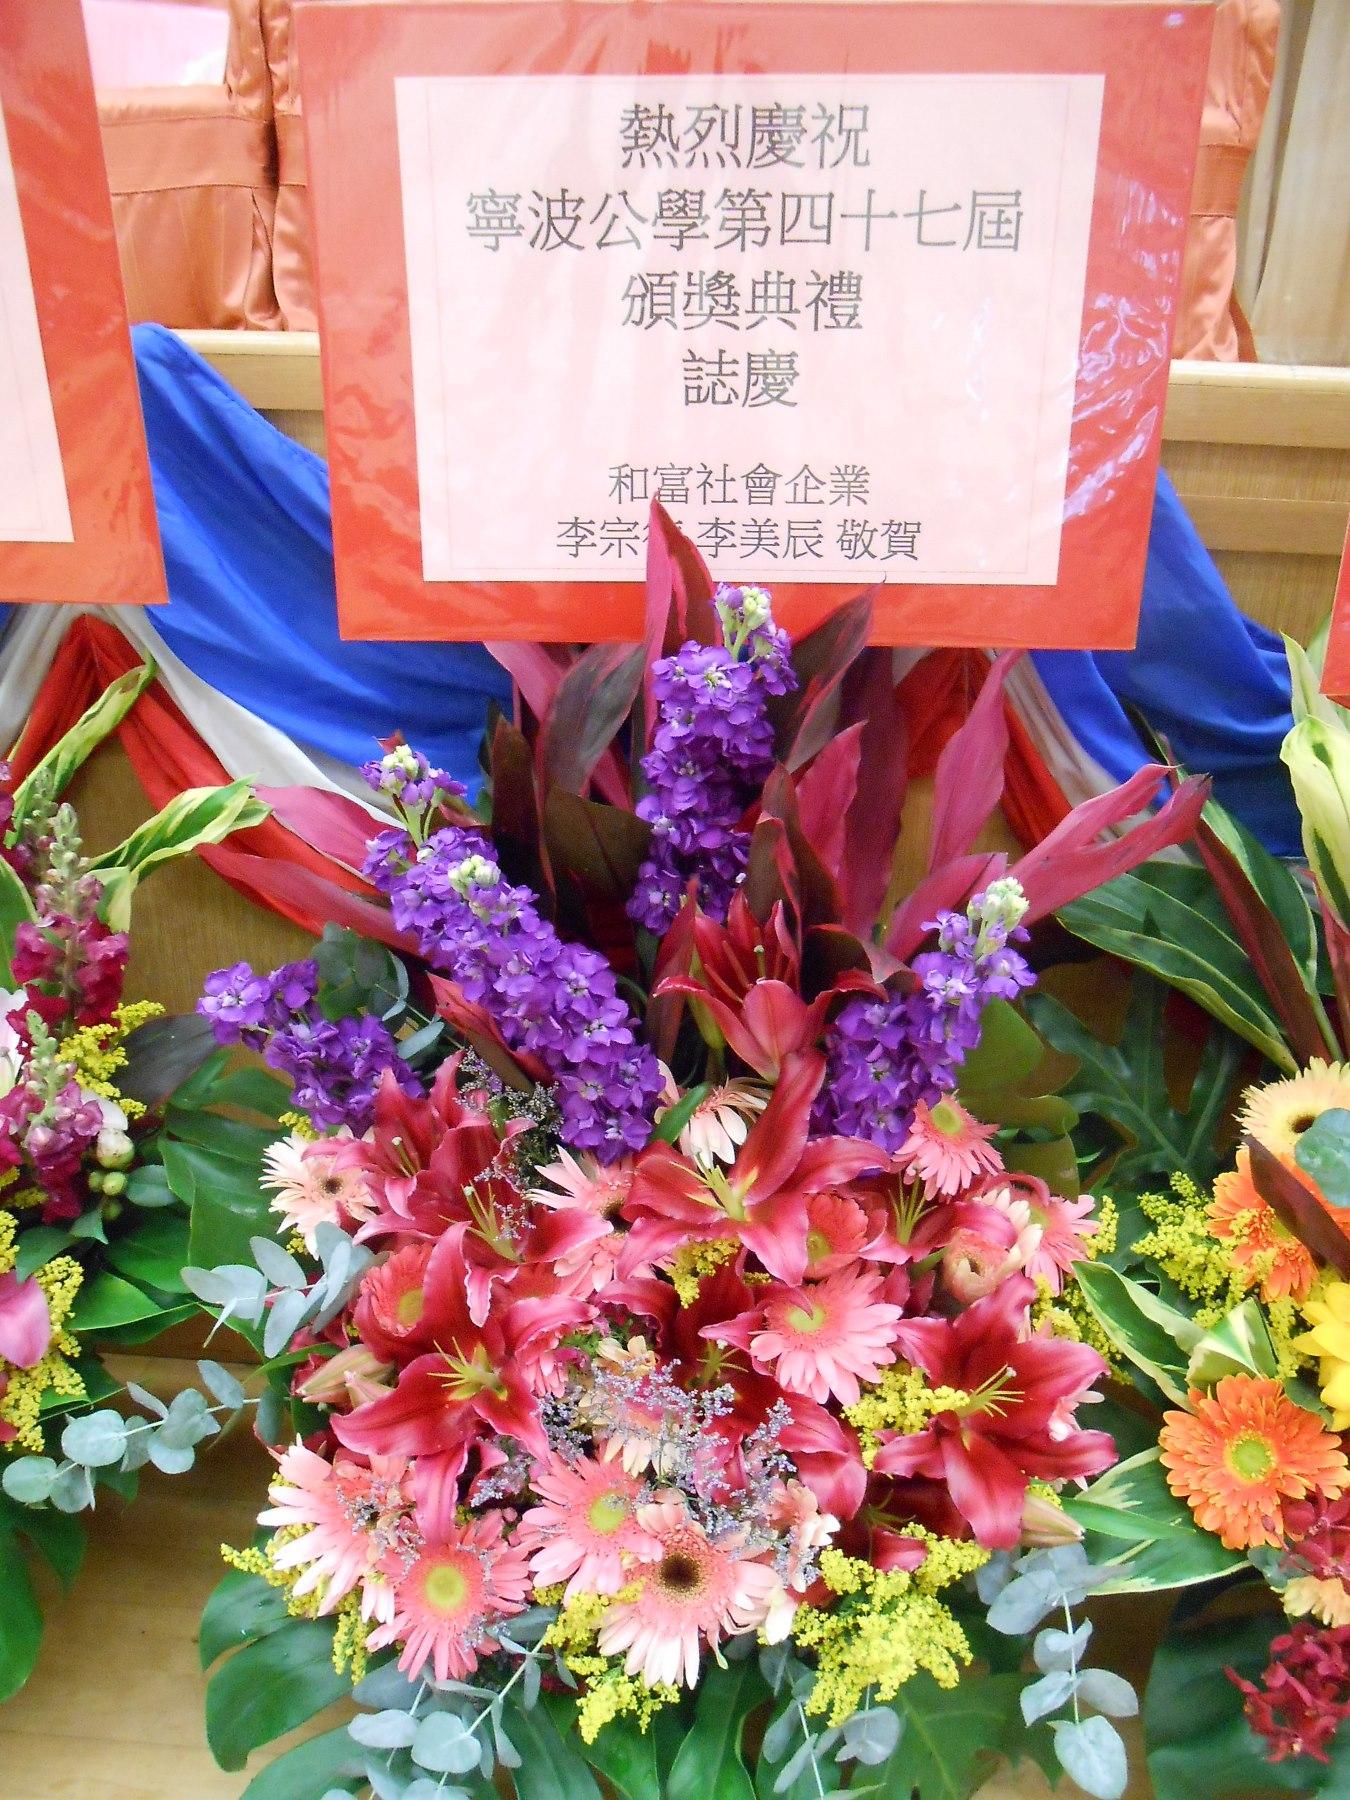 http://npc.edu.hk/sites/default/files/dscn9737.jpg